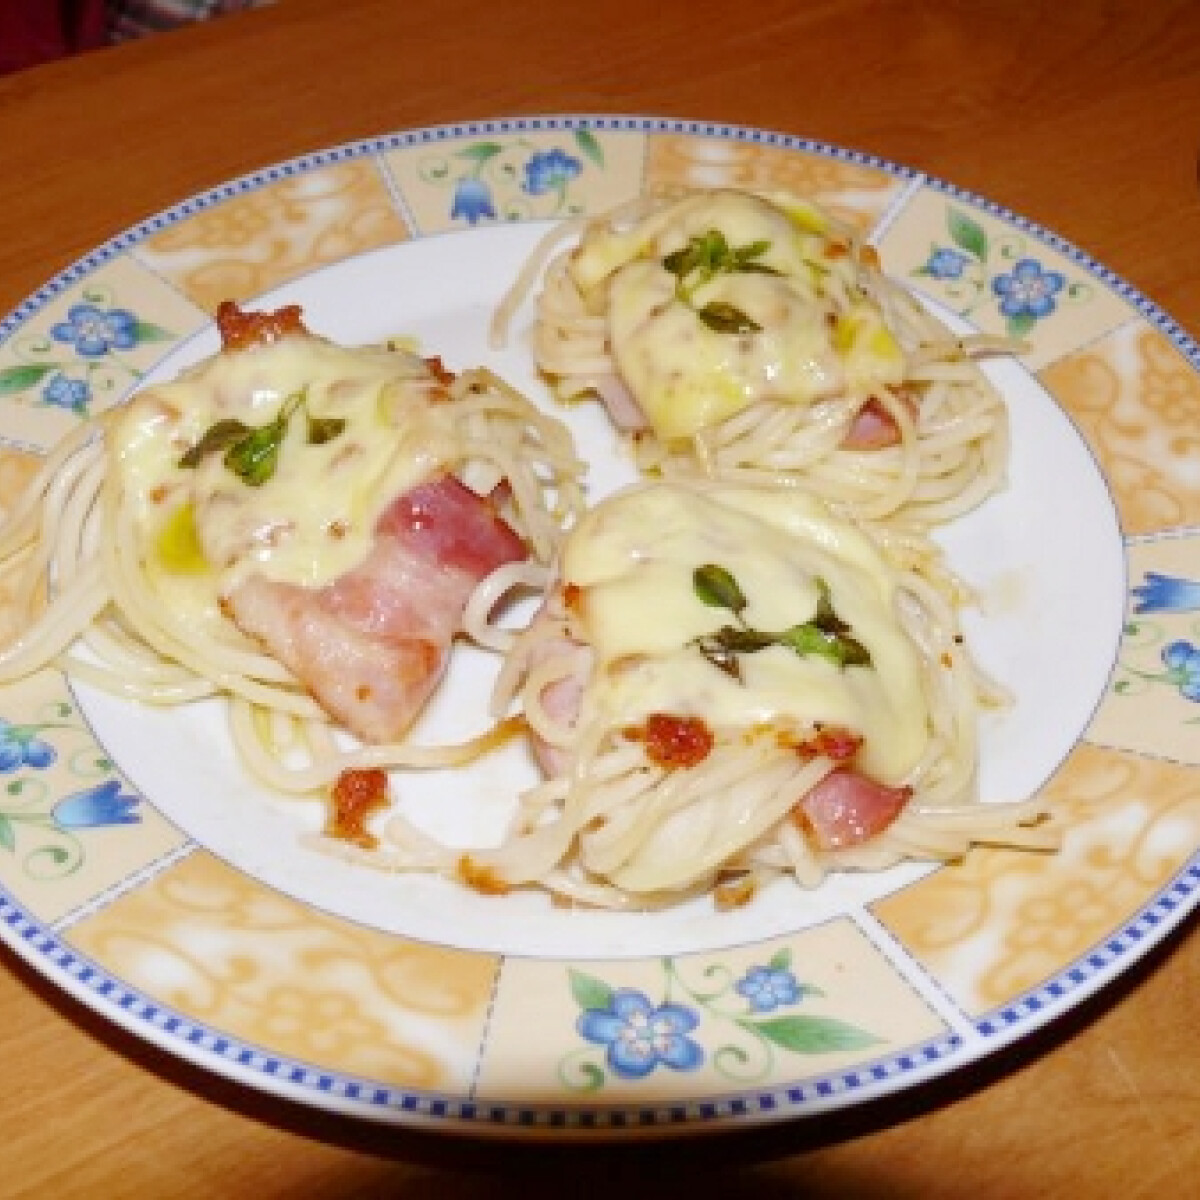 Ezen a képen: Spagetti gombóc